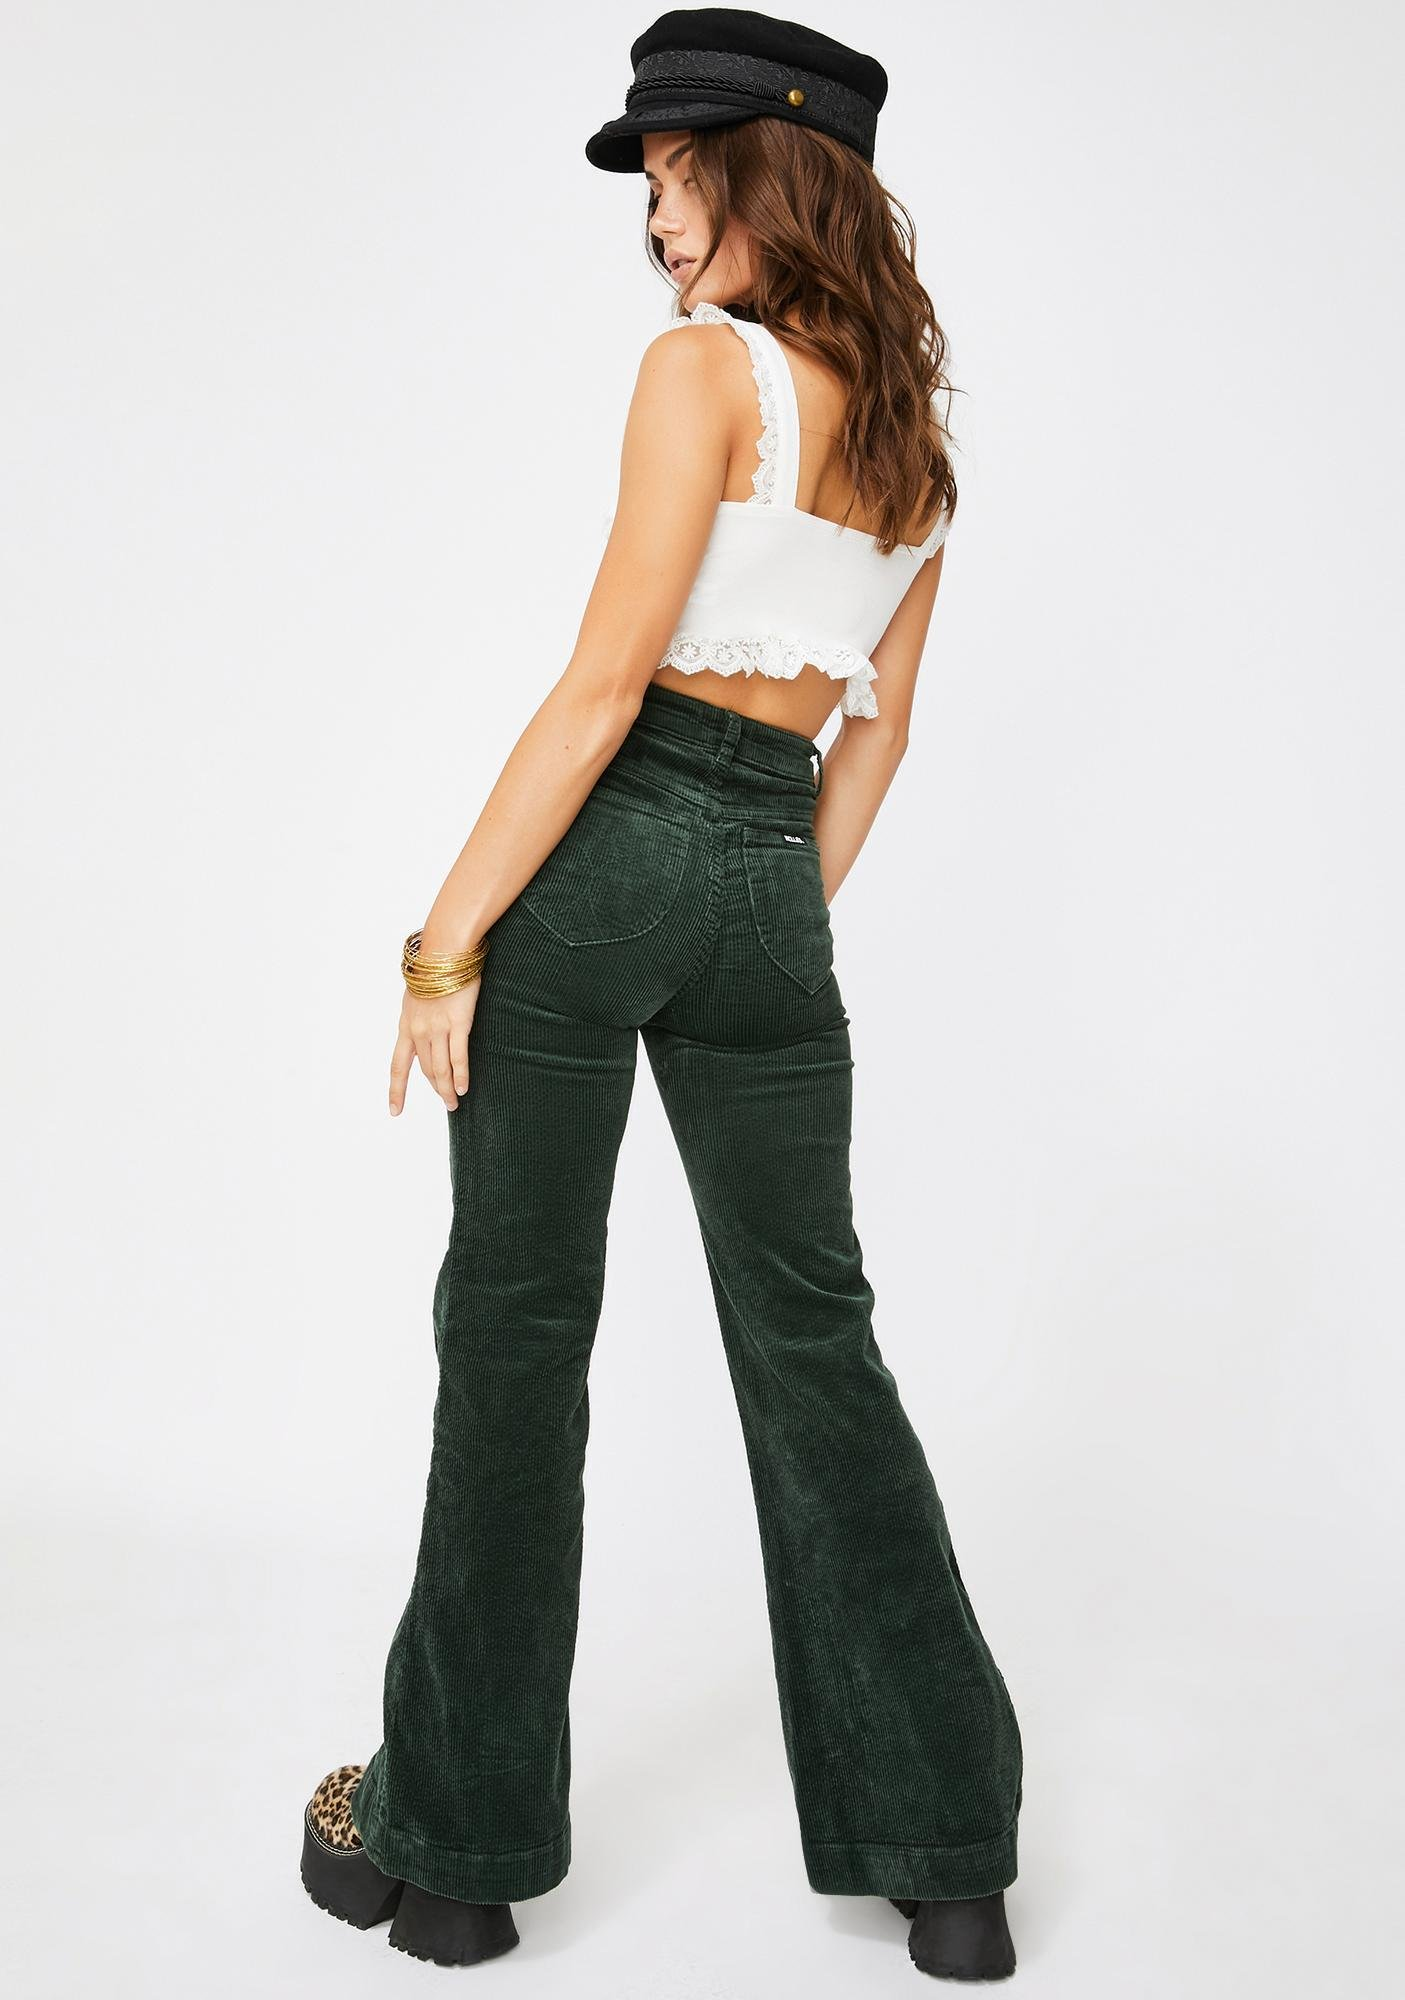 Rollas Ivy Eastcoast Corduroy Flare Pants